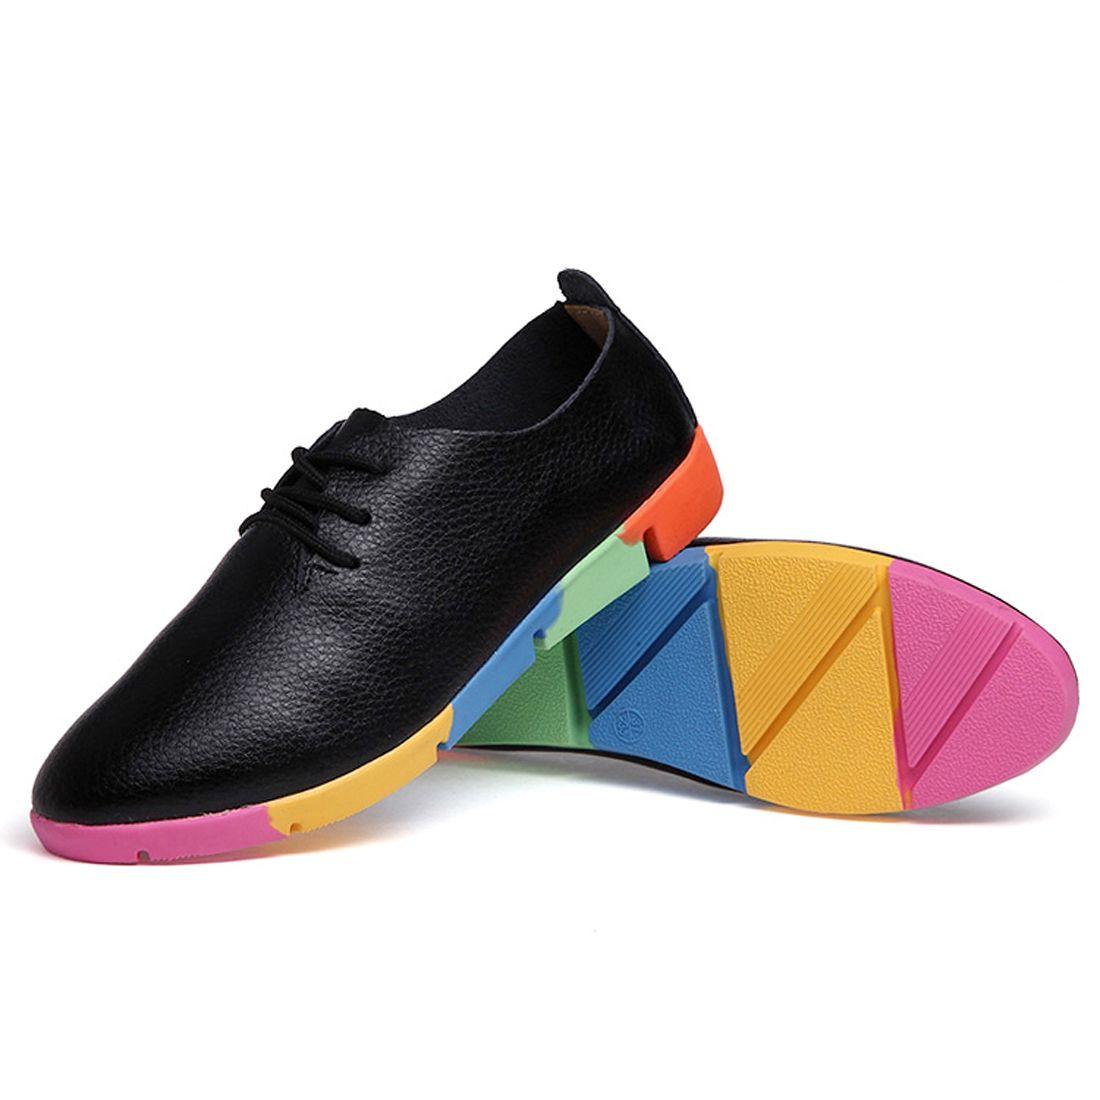 25bbccd11054 black white Rainbow Women Multicolor Sole Flat Cusp Genuine Leather Leisure  Pointedly Career Frenum Autumn Student Single Shoes